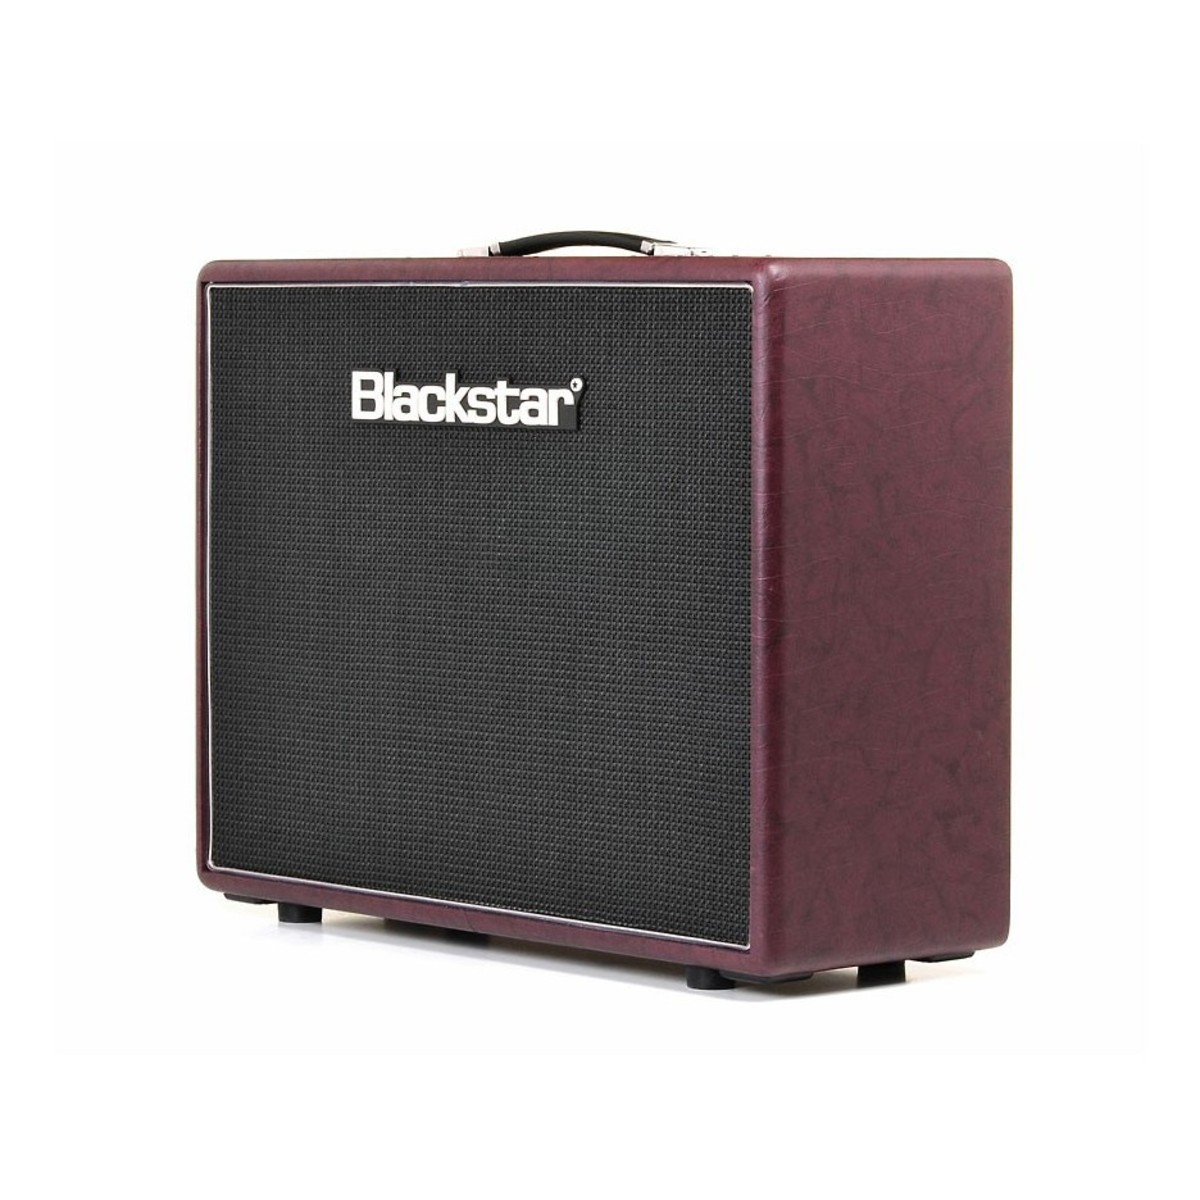 blackstar artisan 30 30w 2 x 12 handwired combo at. Black Bedroom Furniture Sets. Home Design Ideas